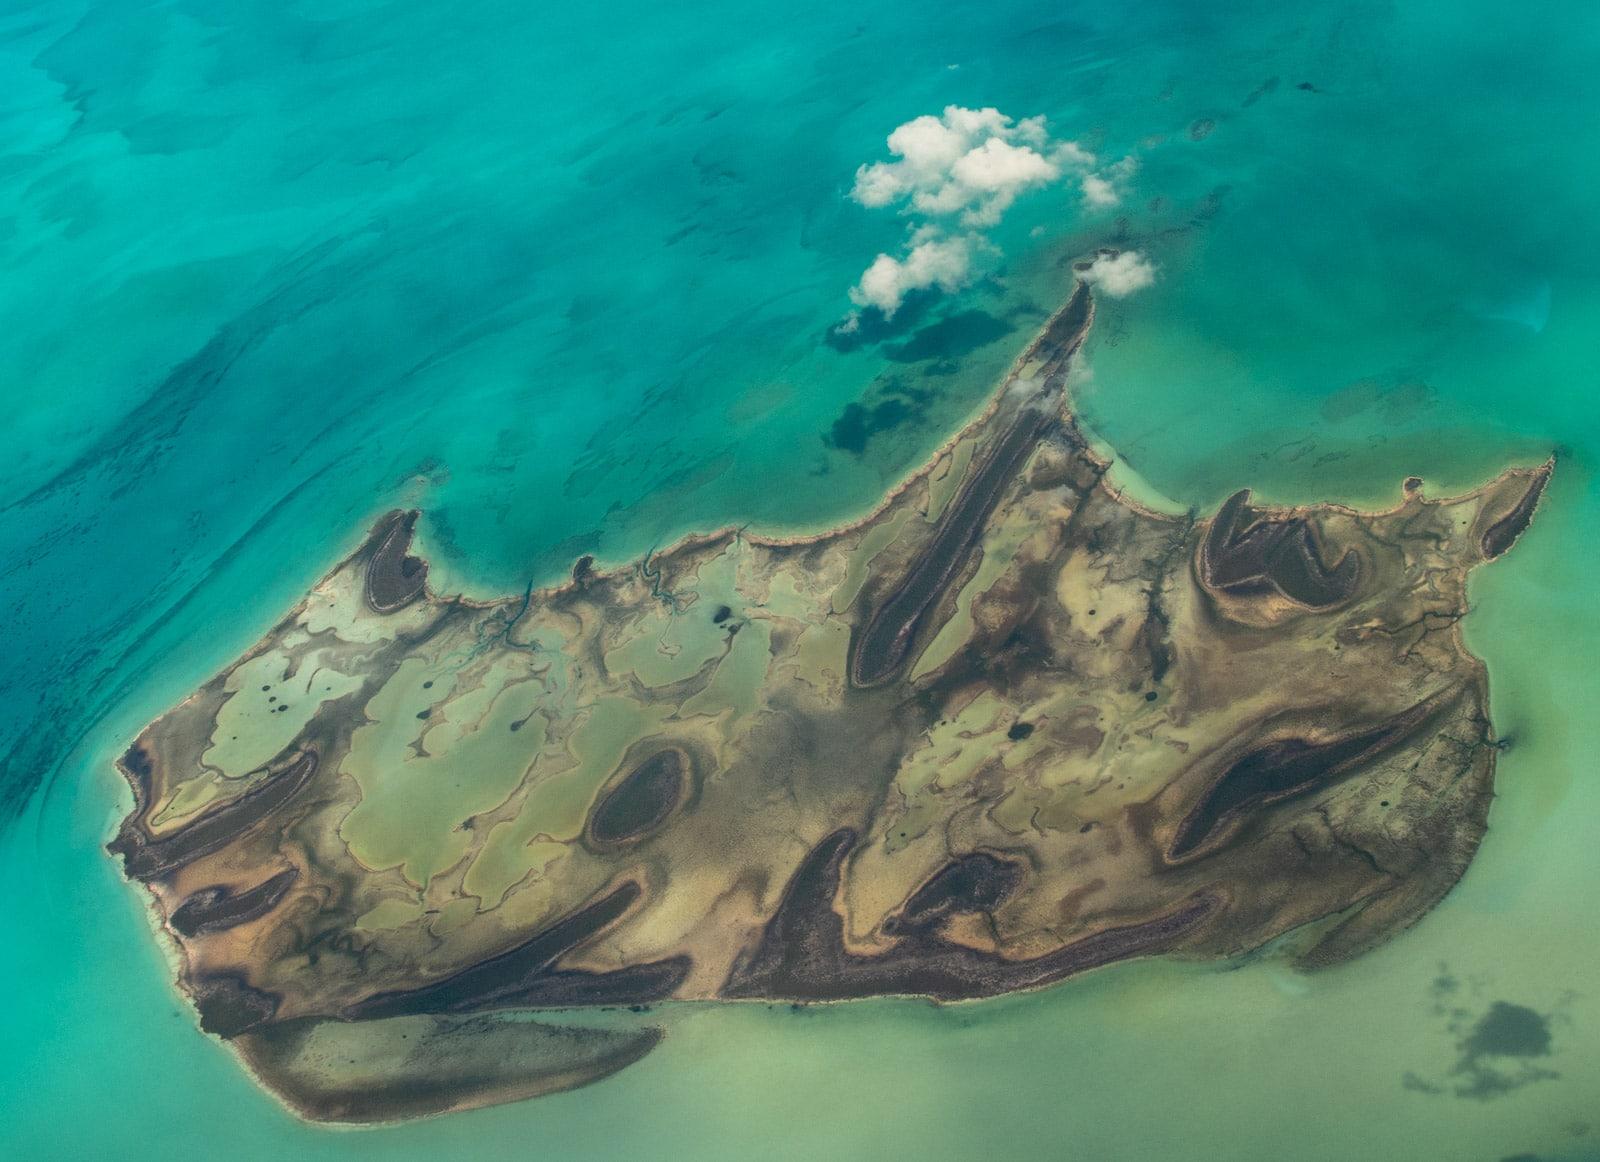 Wiliams Island